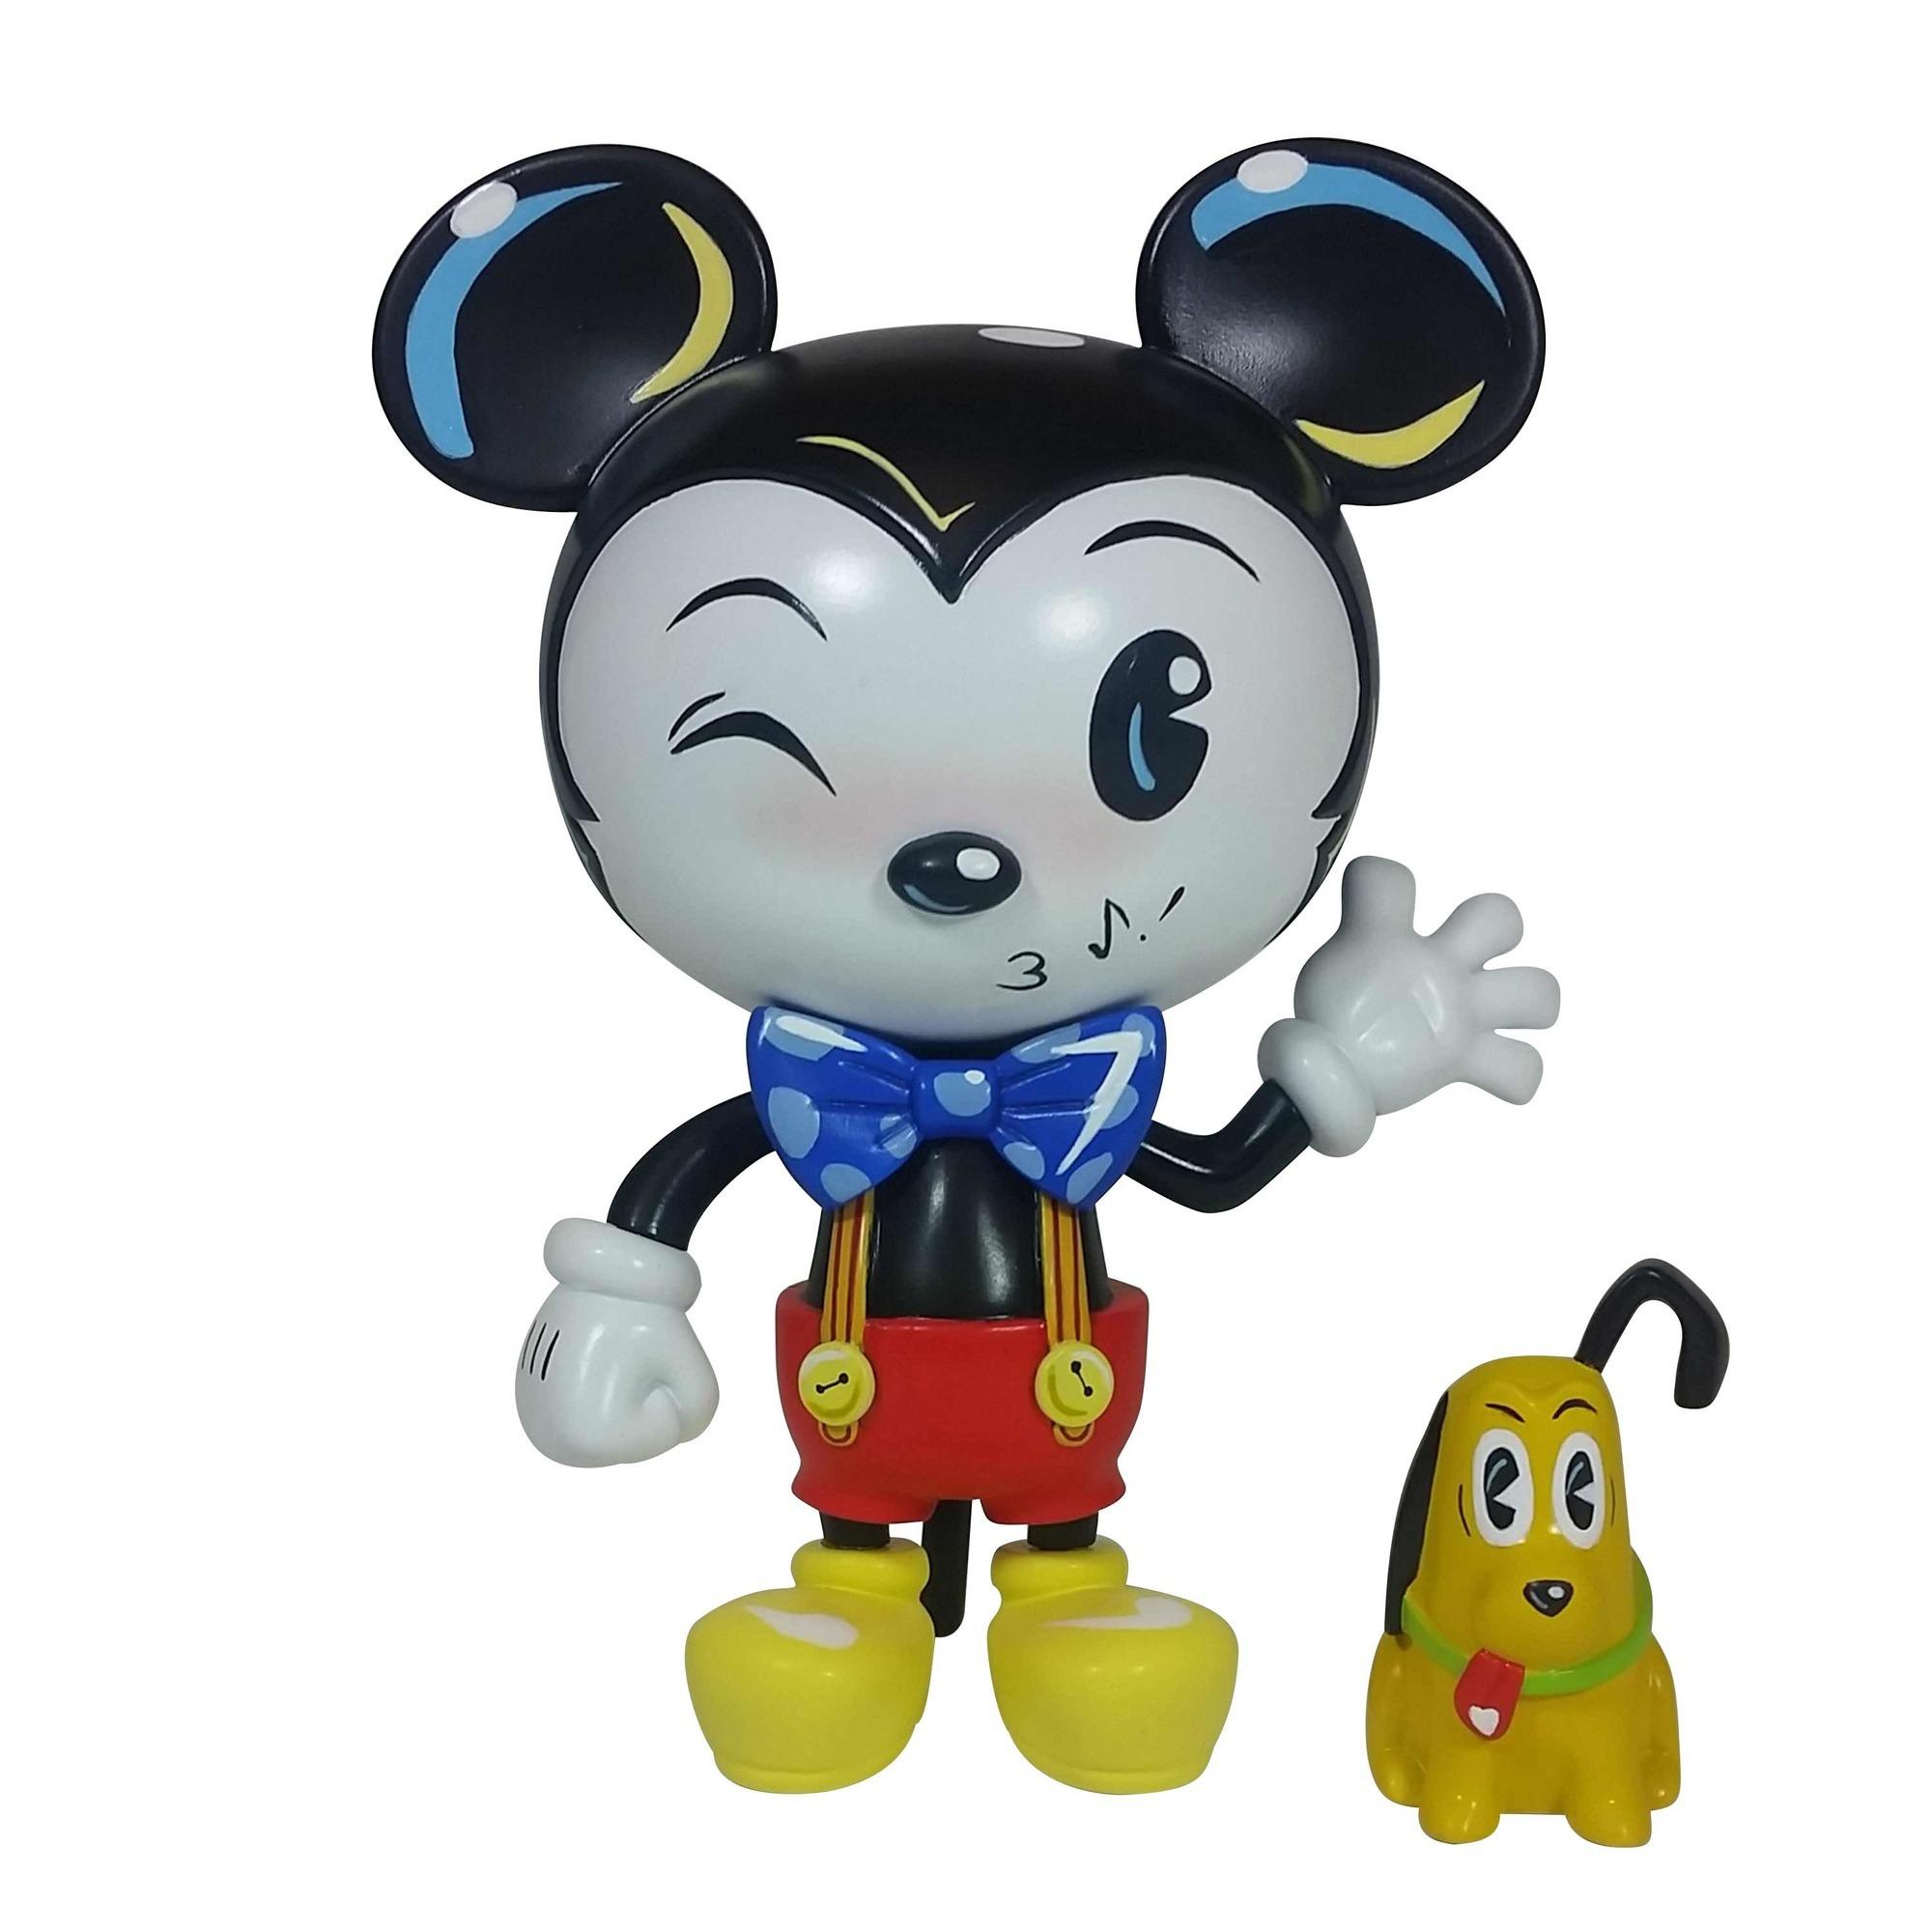 World of Miss Mindy 6001680N Vinyl - Mickey